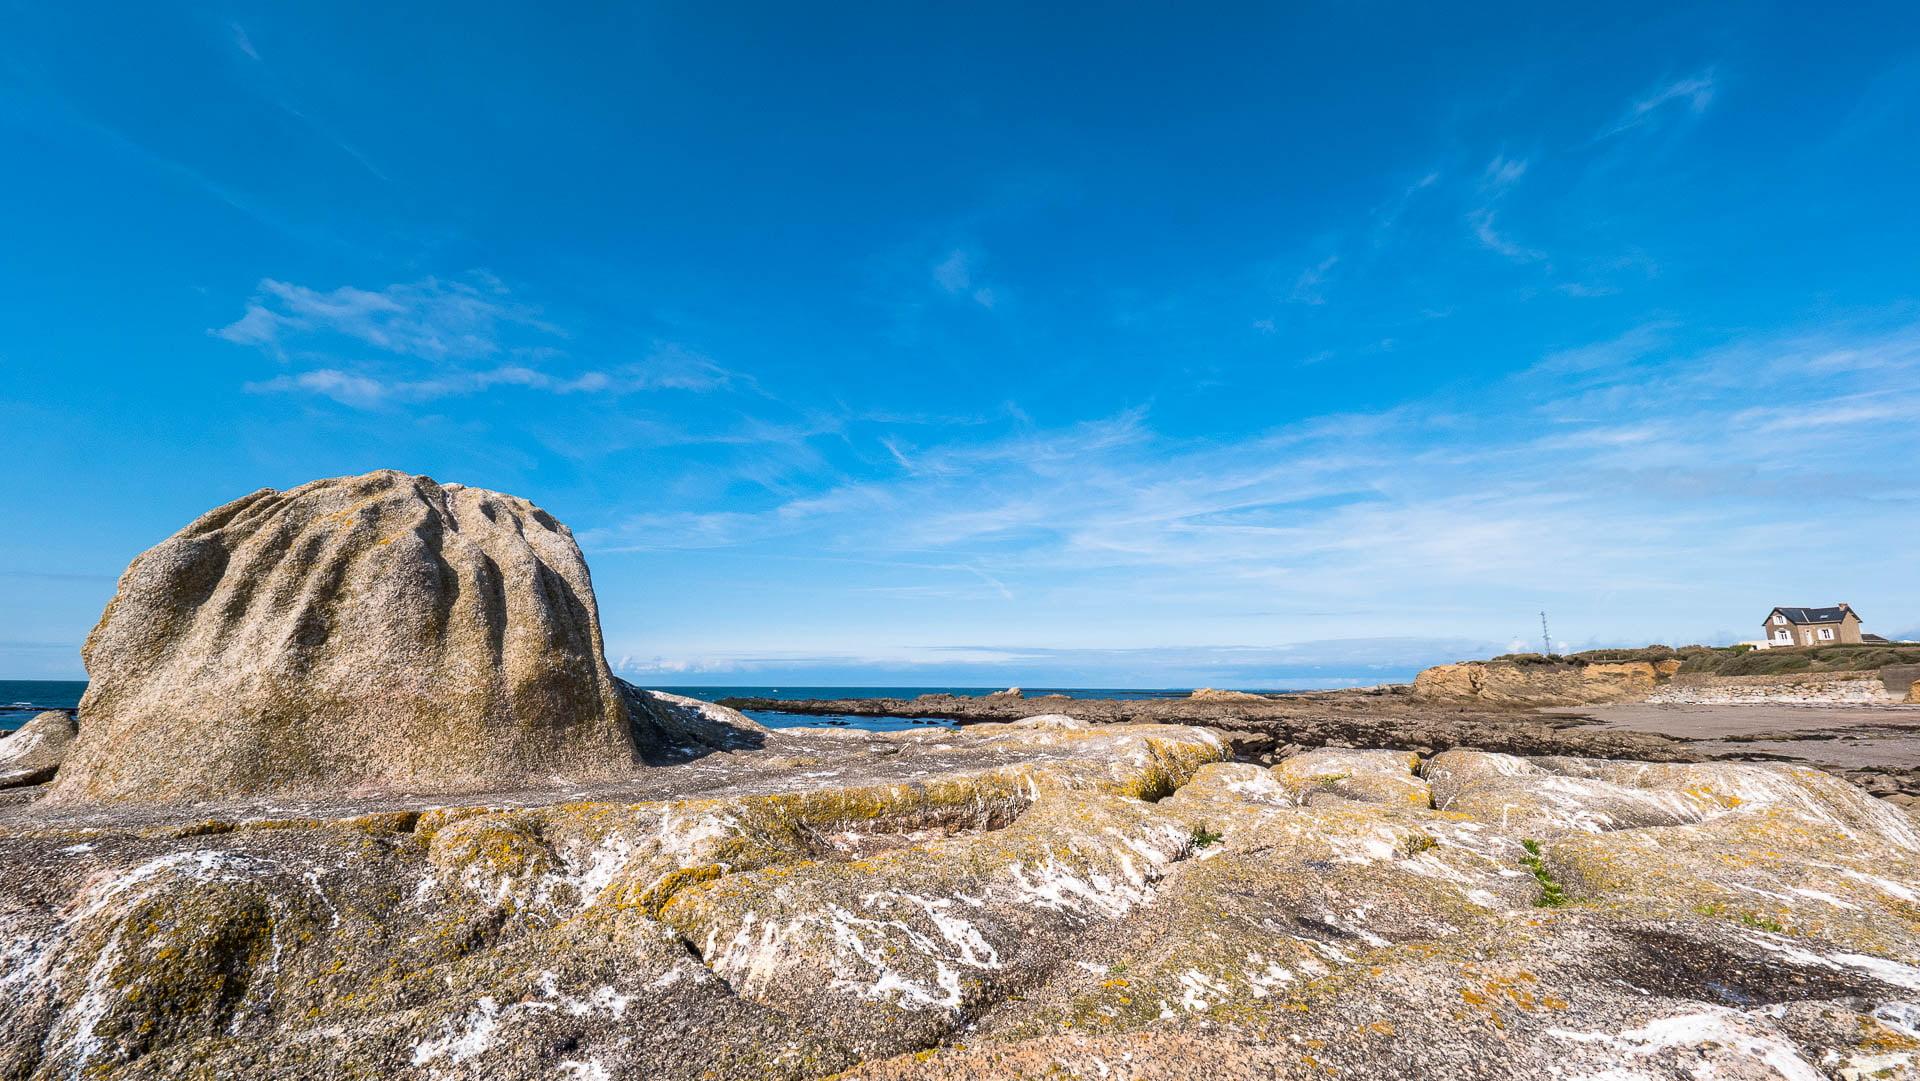 Piriac plage mine almanzor - Les globe blogueurs - blog voyage nature